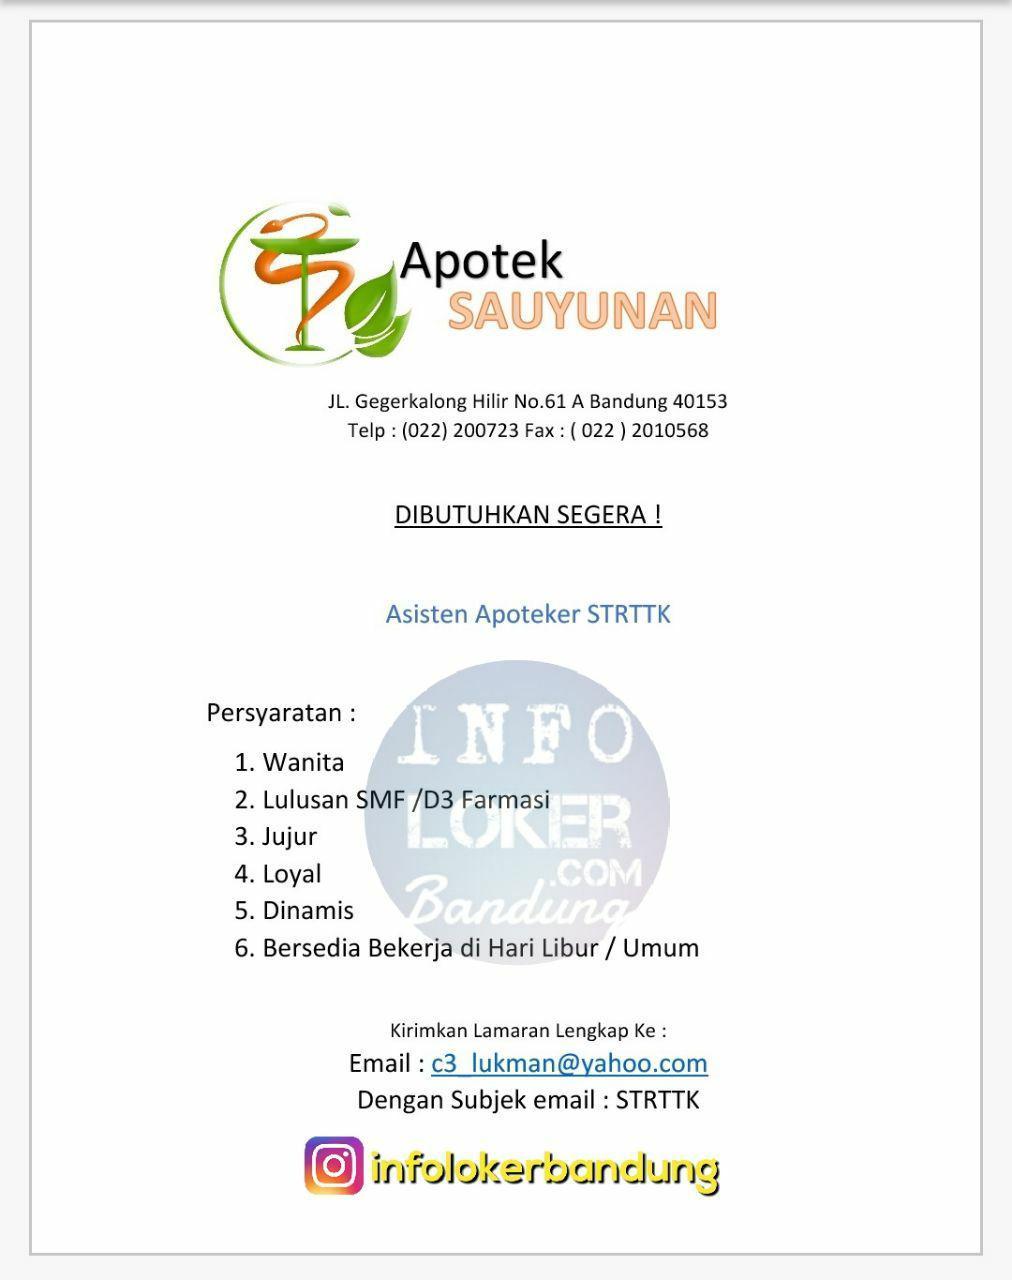 Lowongan Kerja Apotek Sauyunan Gegerkalong Bandung November 2017